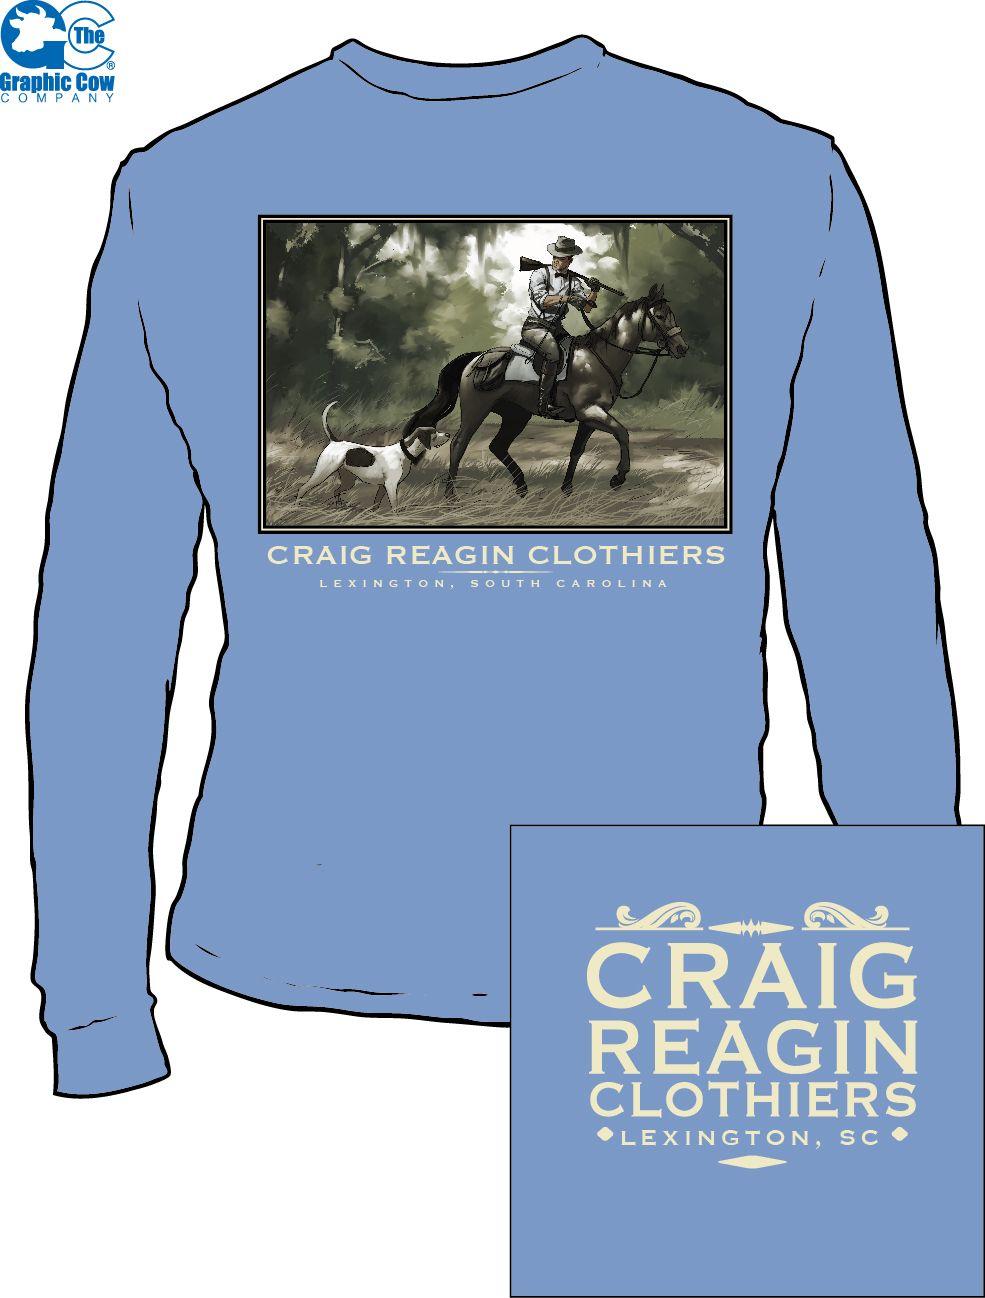 Horseback hunter for Craig Reagan clothiers.